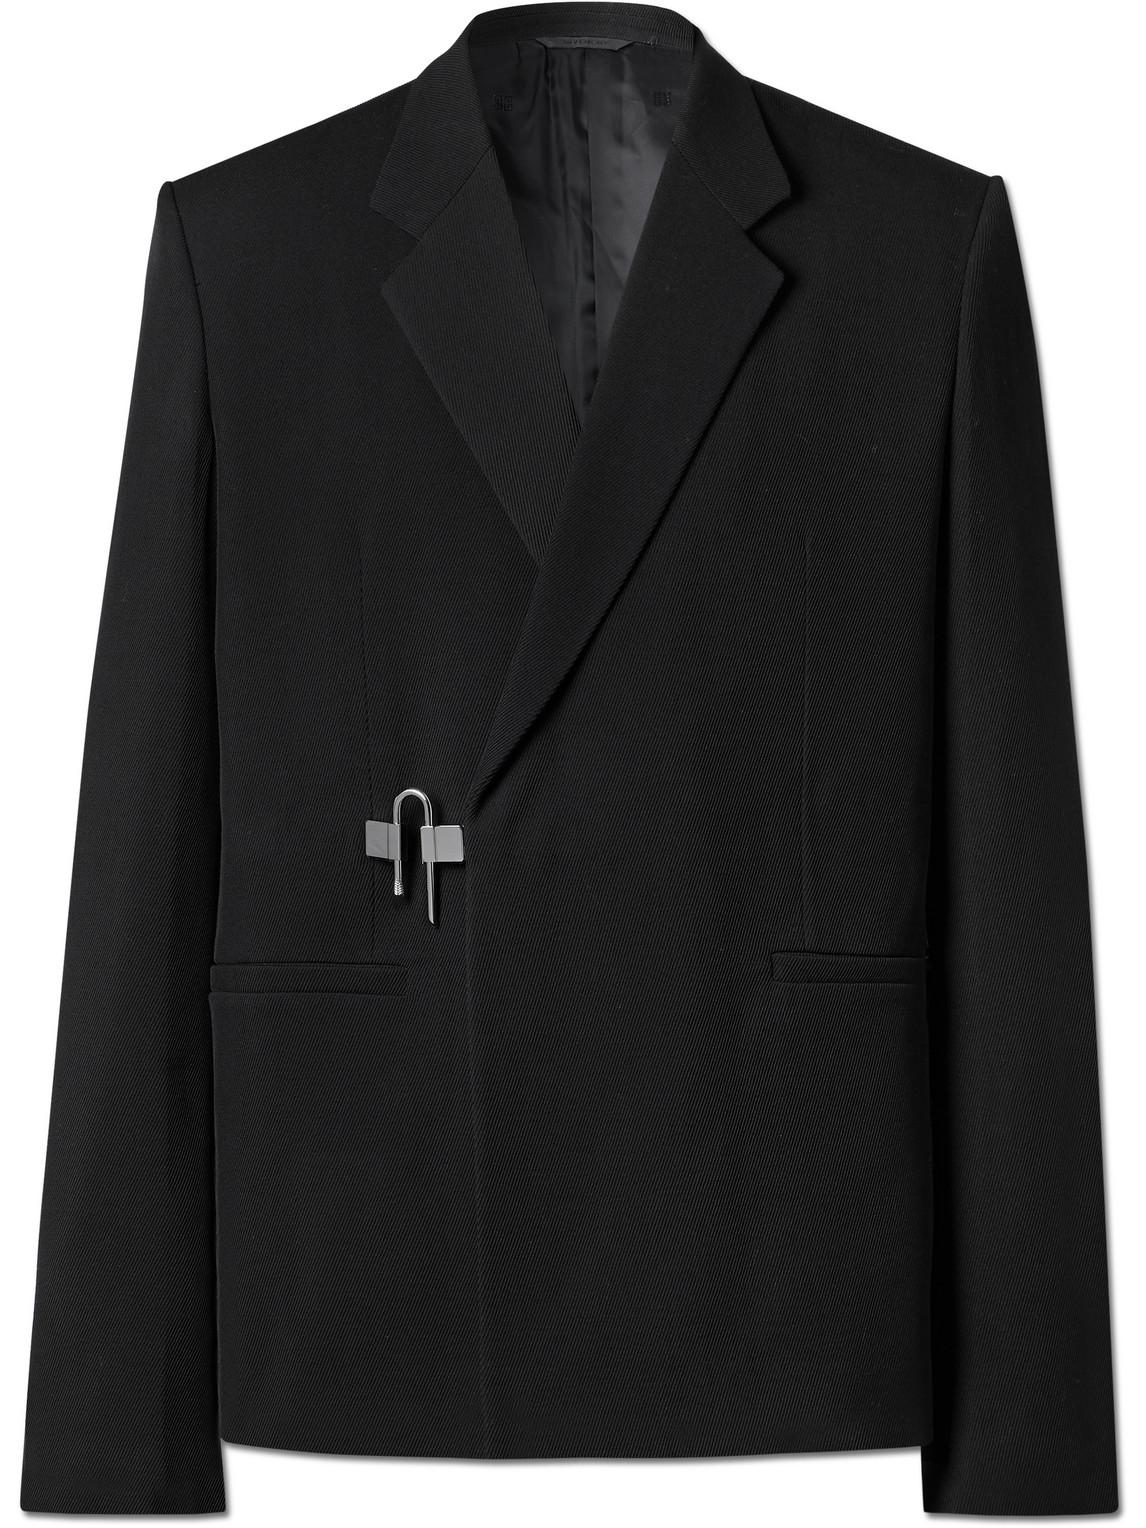 Givenchy Wools EMBELLISHED VIRGIN WOOL-TWILL BLAZER